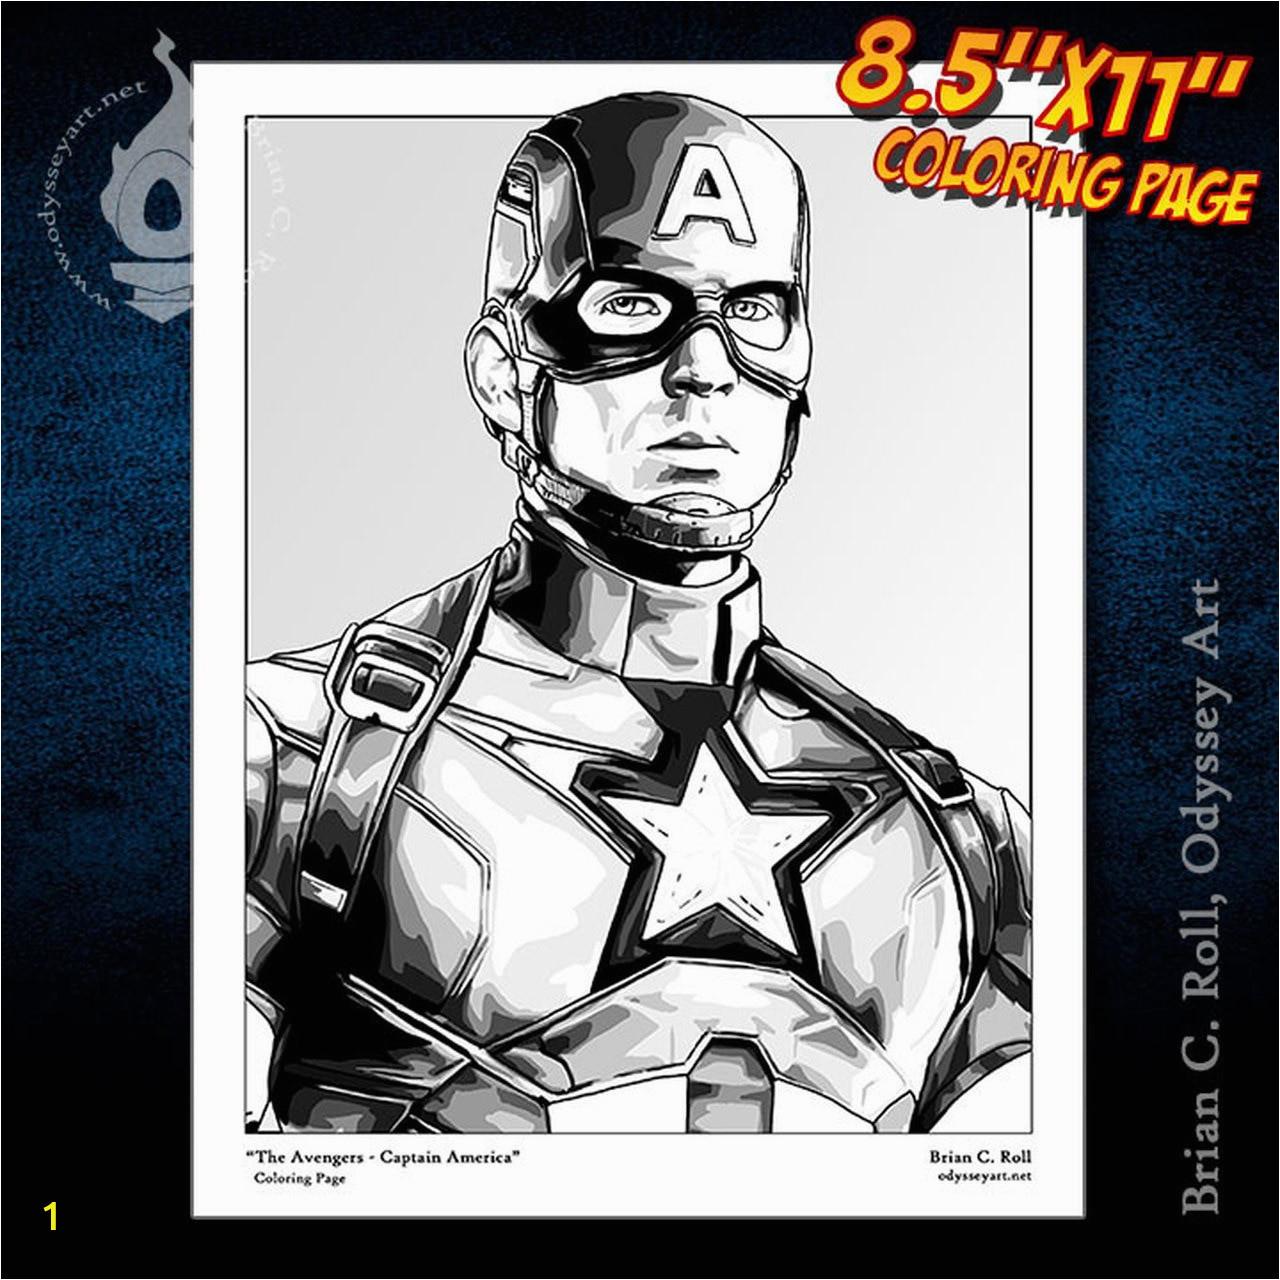 Avengers CaptainAmerica 8x11coloringpage store